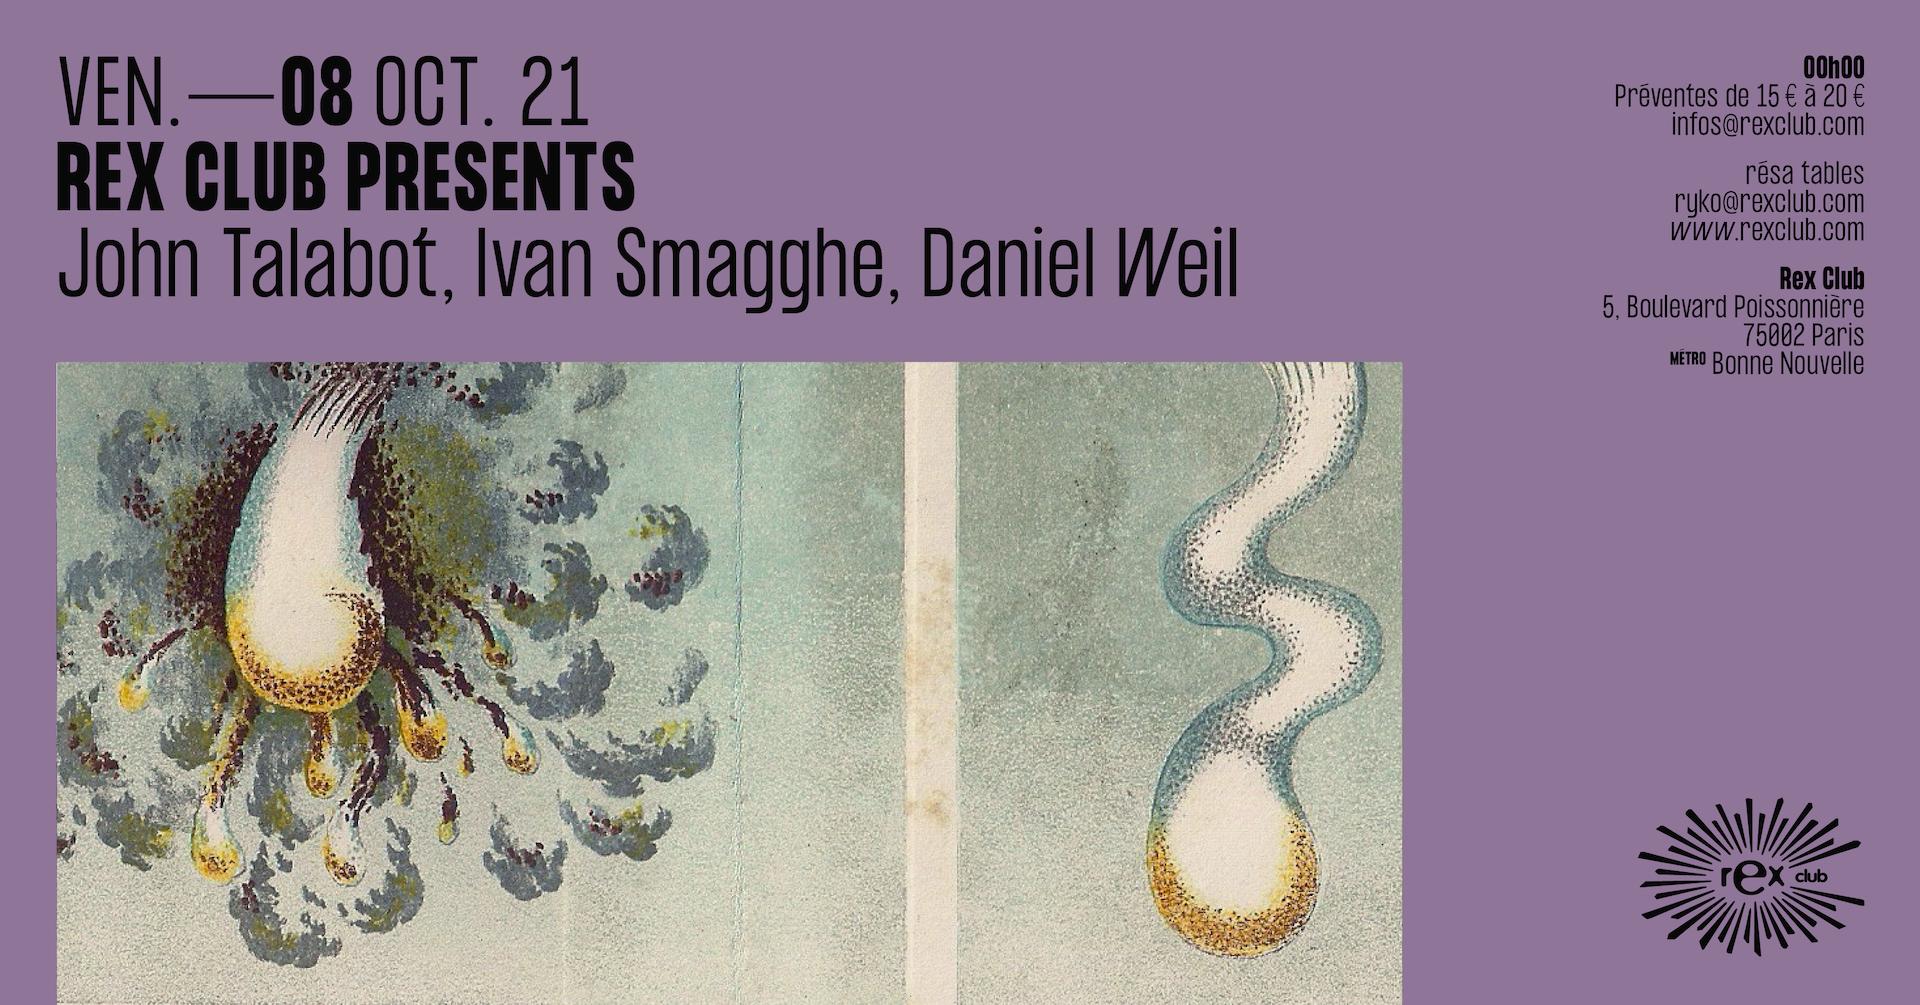 Rex Club Presents: John Talabot, Ivan Smagghe, Daniel Weil